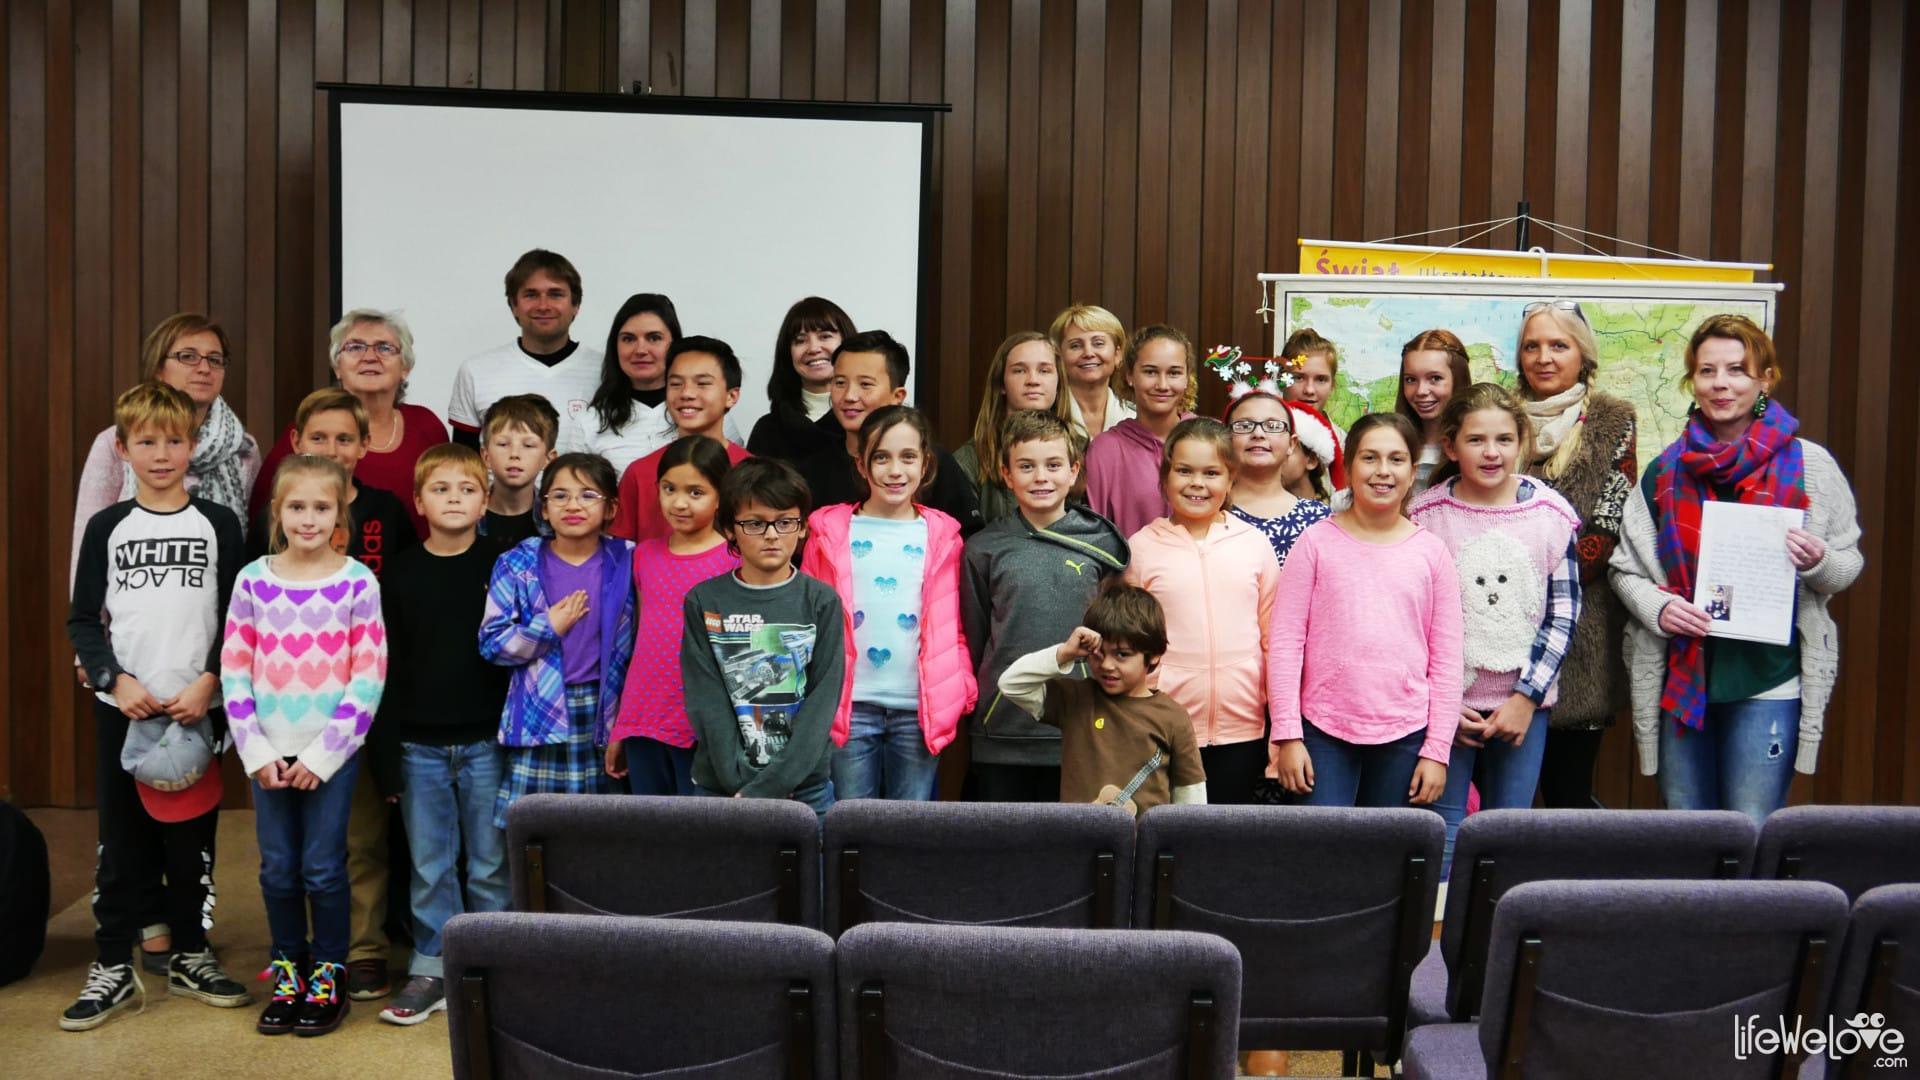 Polish School in the US